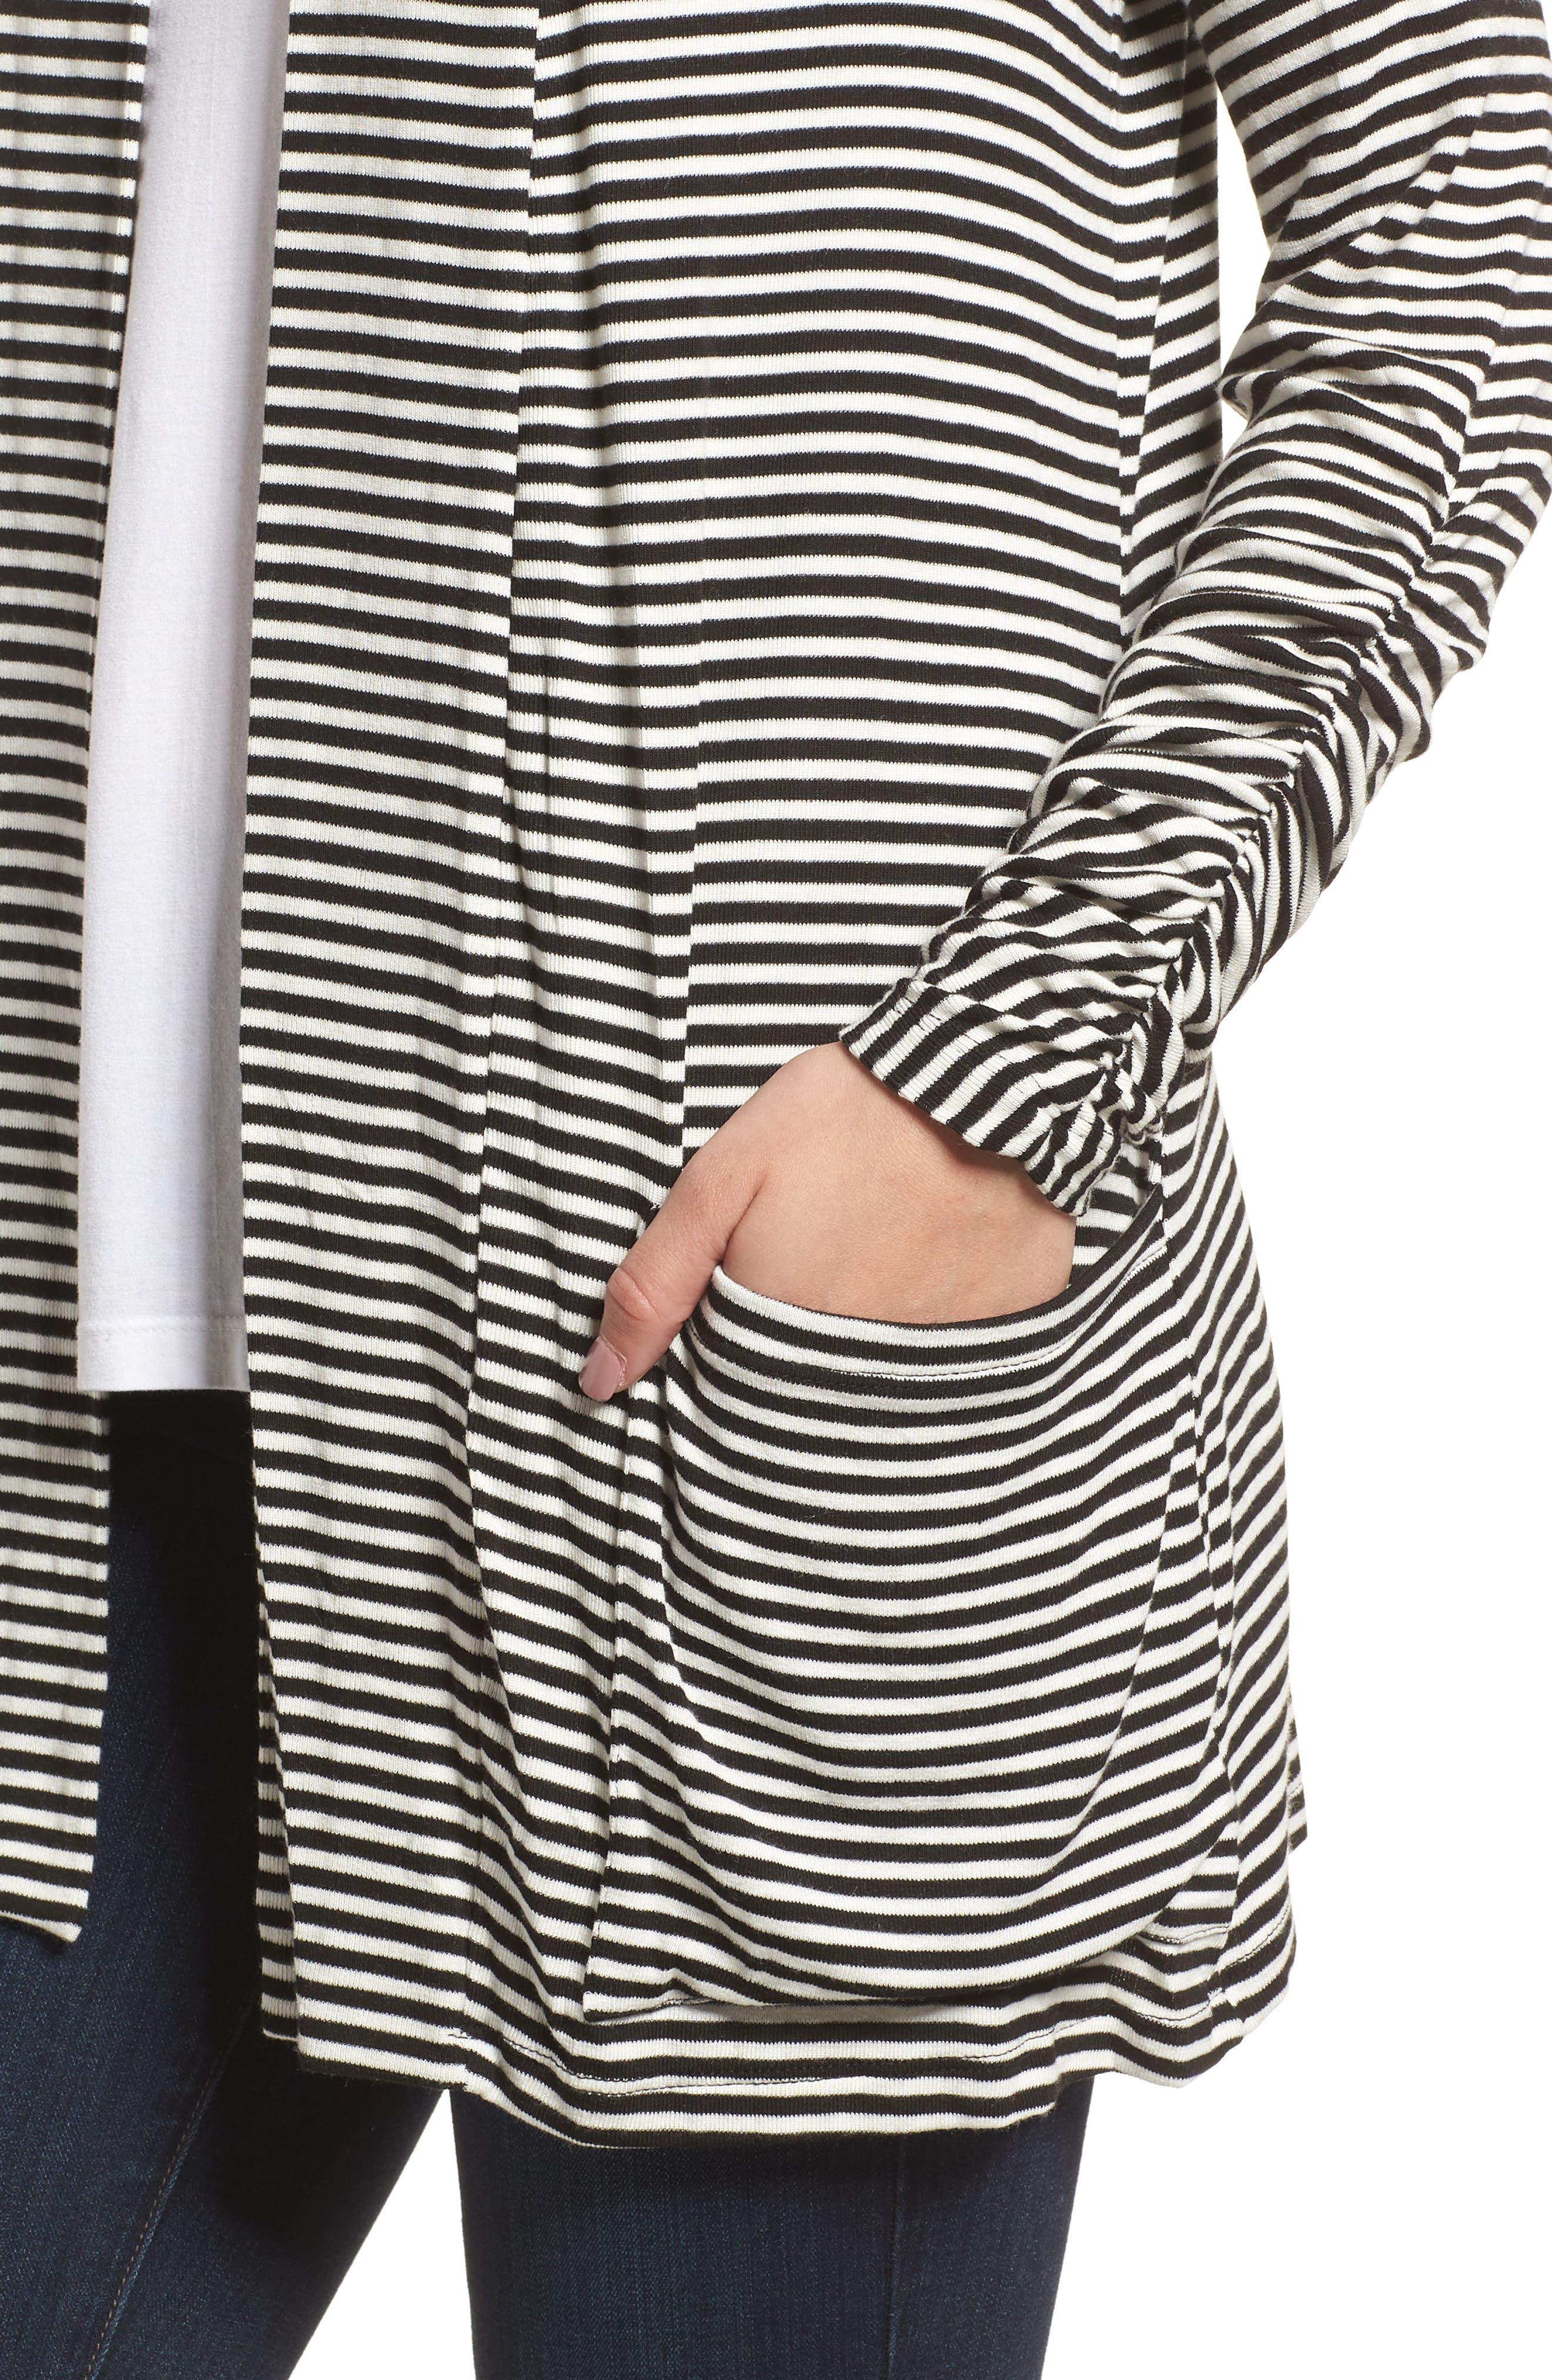 Ruched Sleeve Cardigan,                             Alternate thumbnail 4, color,                             Black/ White Stripe